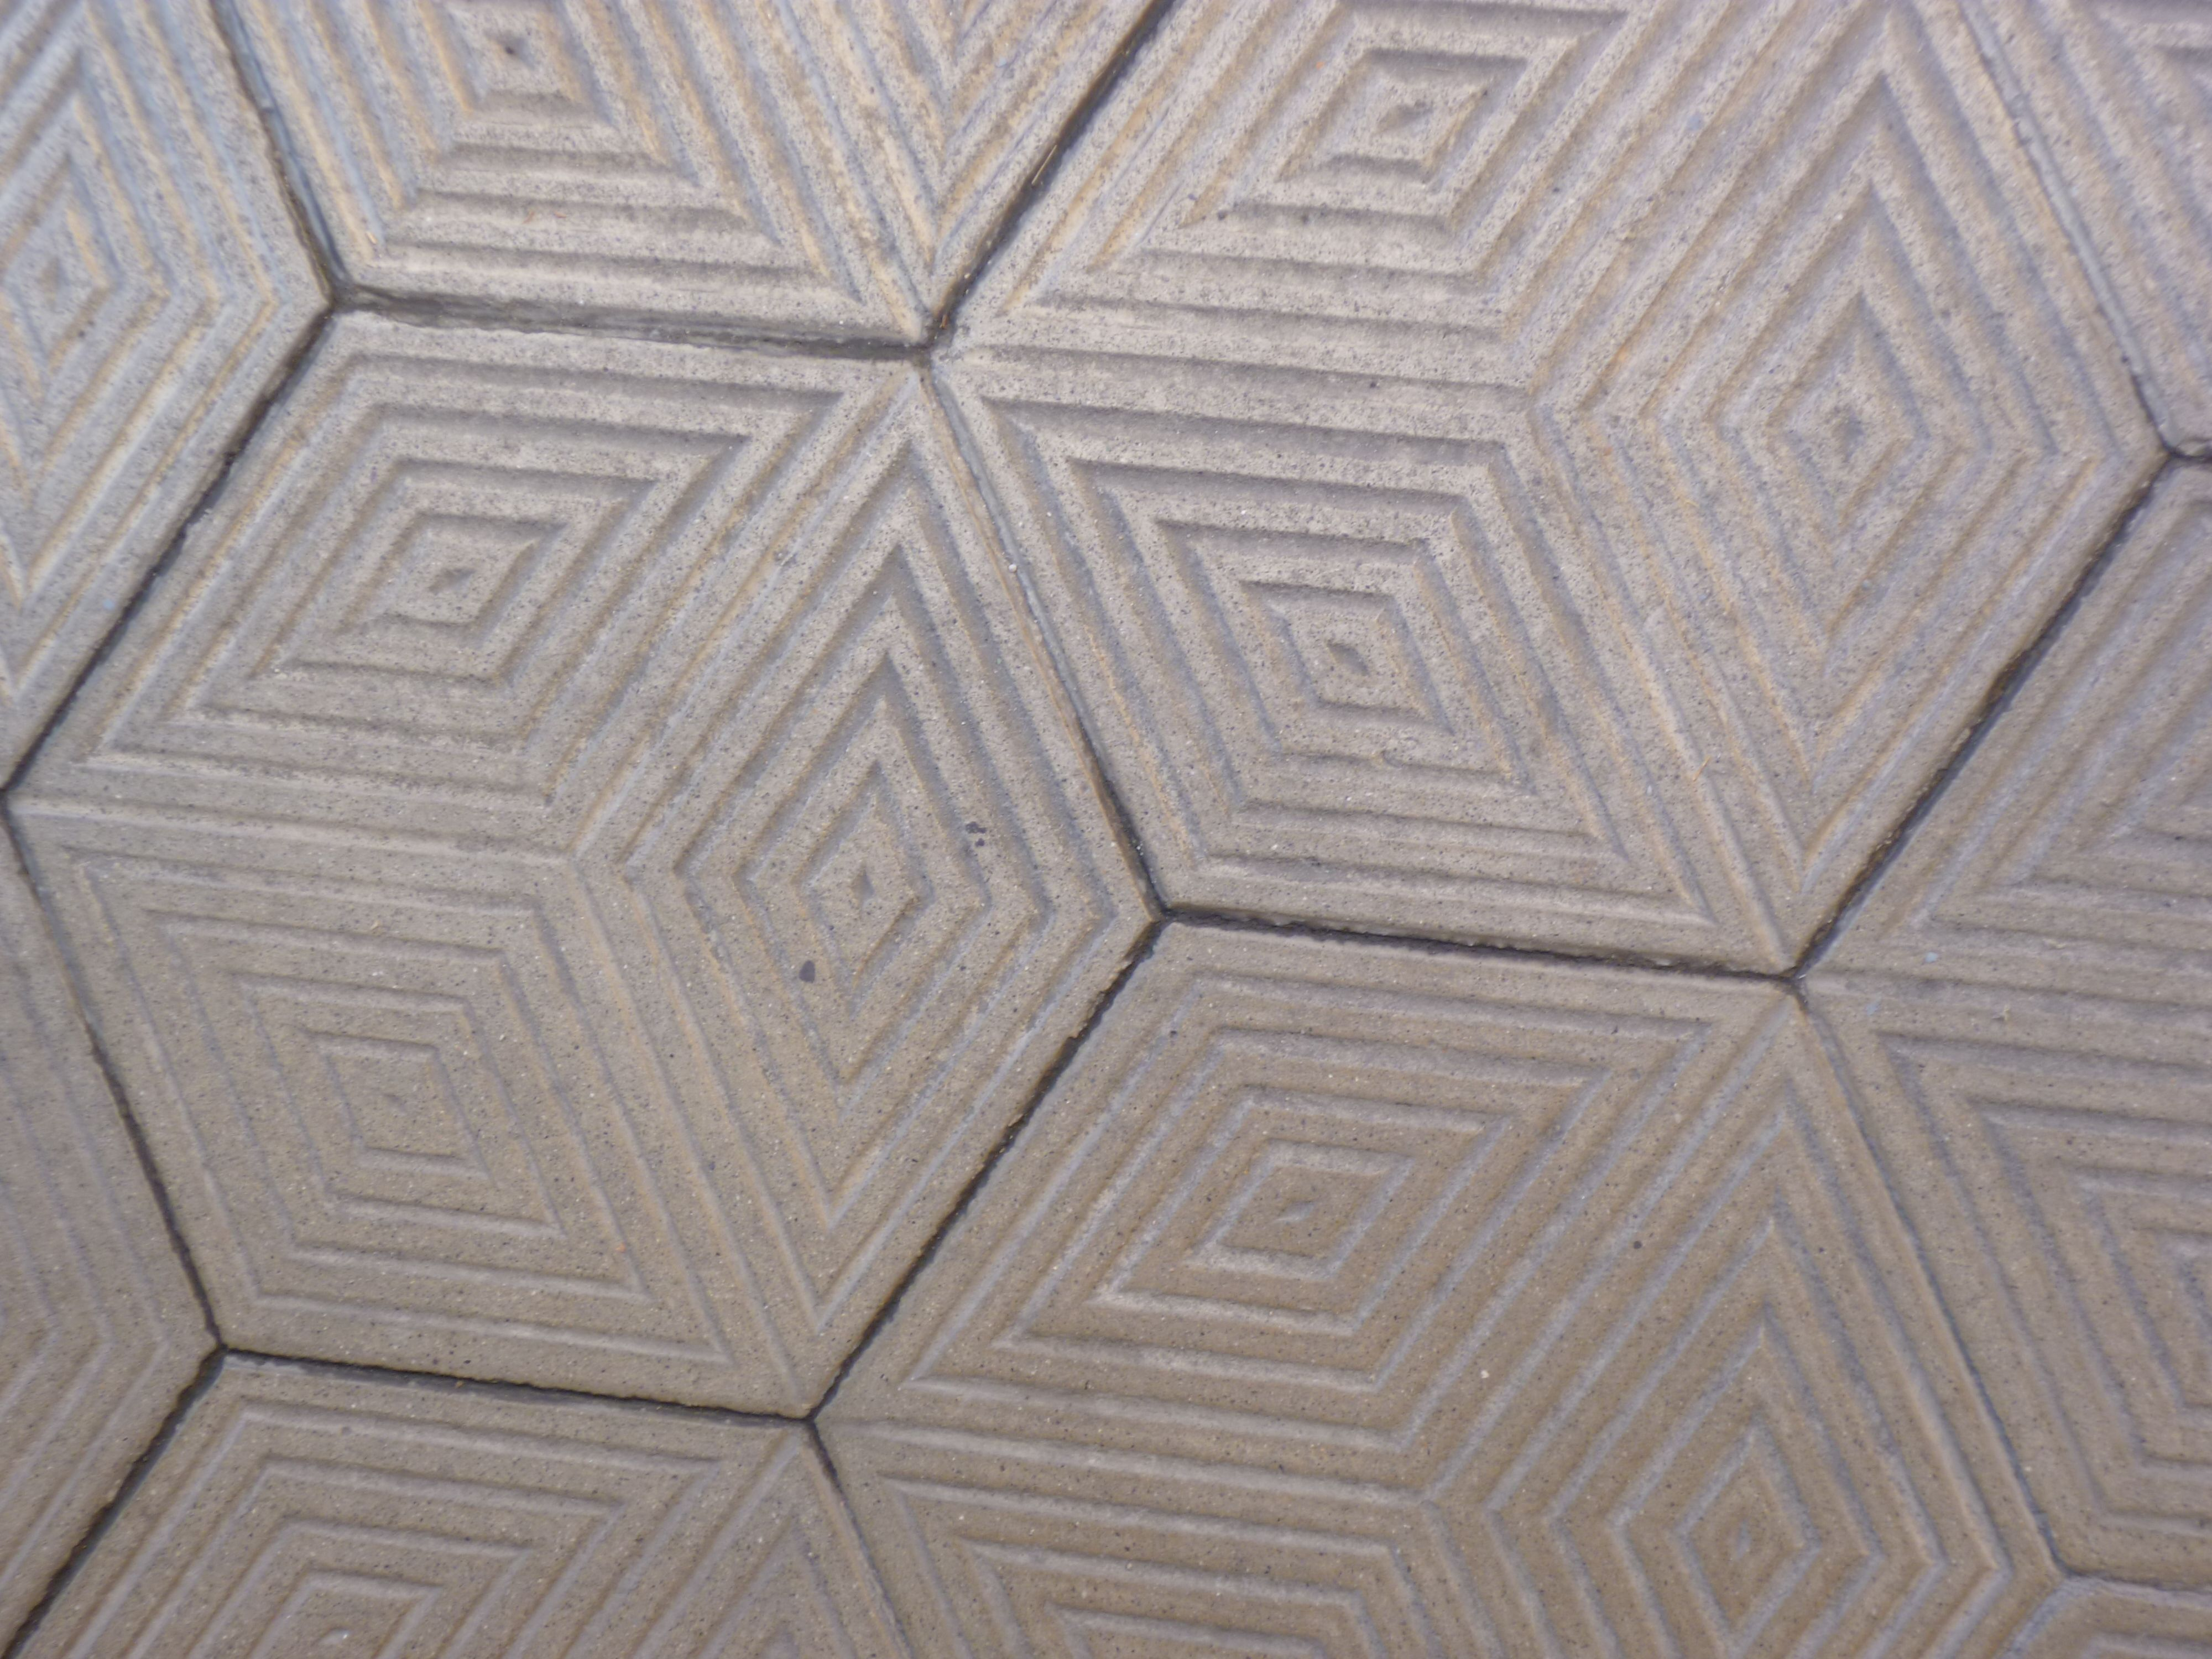 Geometric hexagonal tile handmade tiles can be colour coordinated geometric hexagonal tile handmade tiles can be colour coordinated and customized re shape texture dailygadgetfo Images